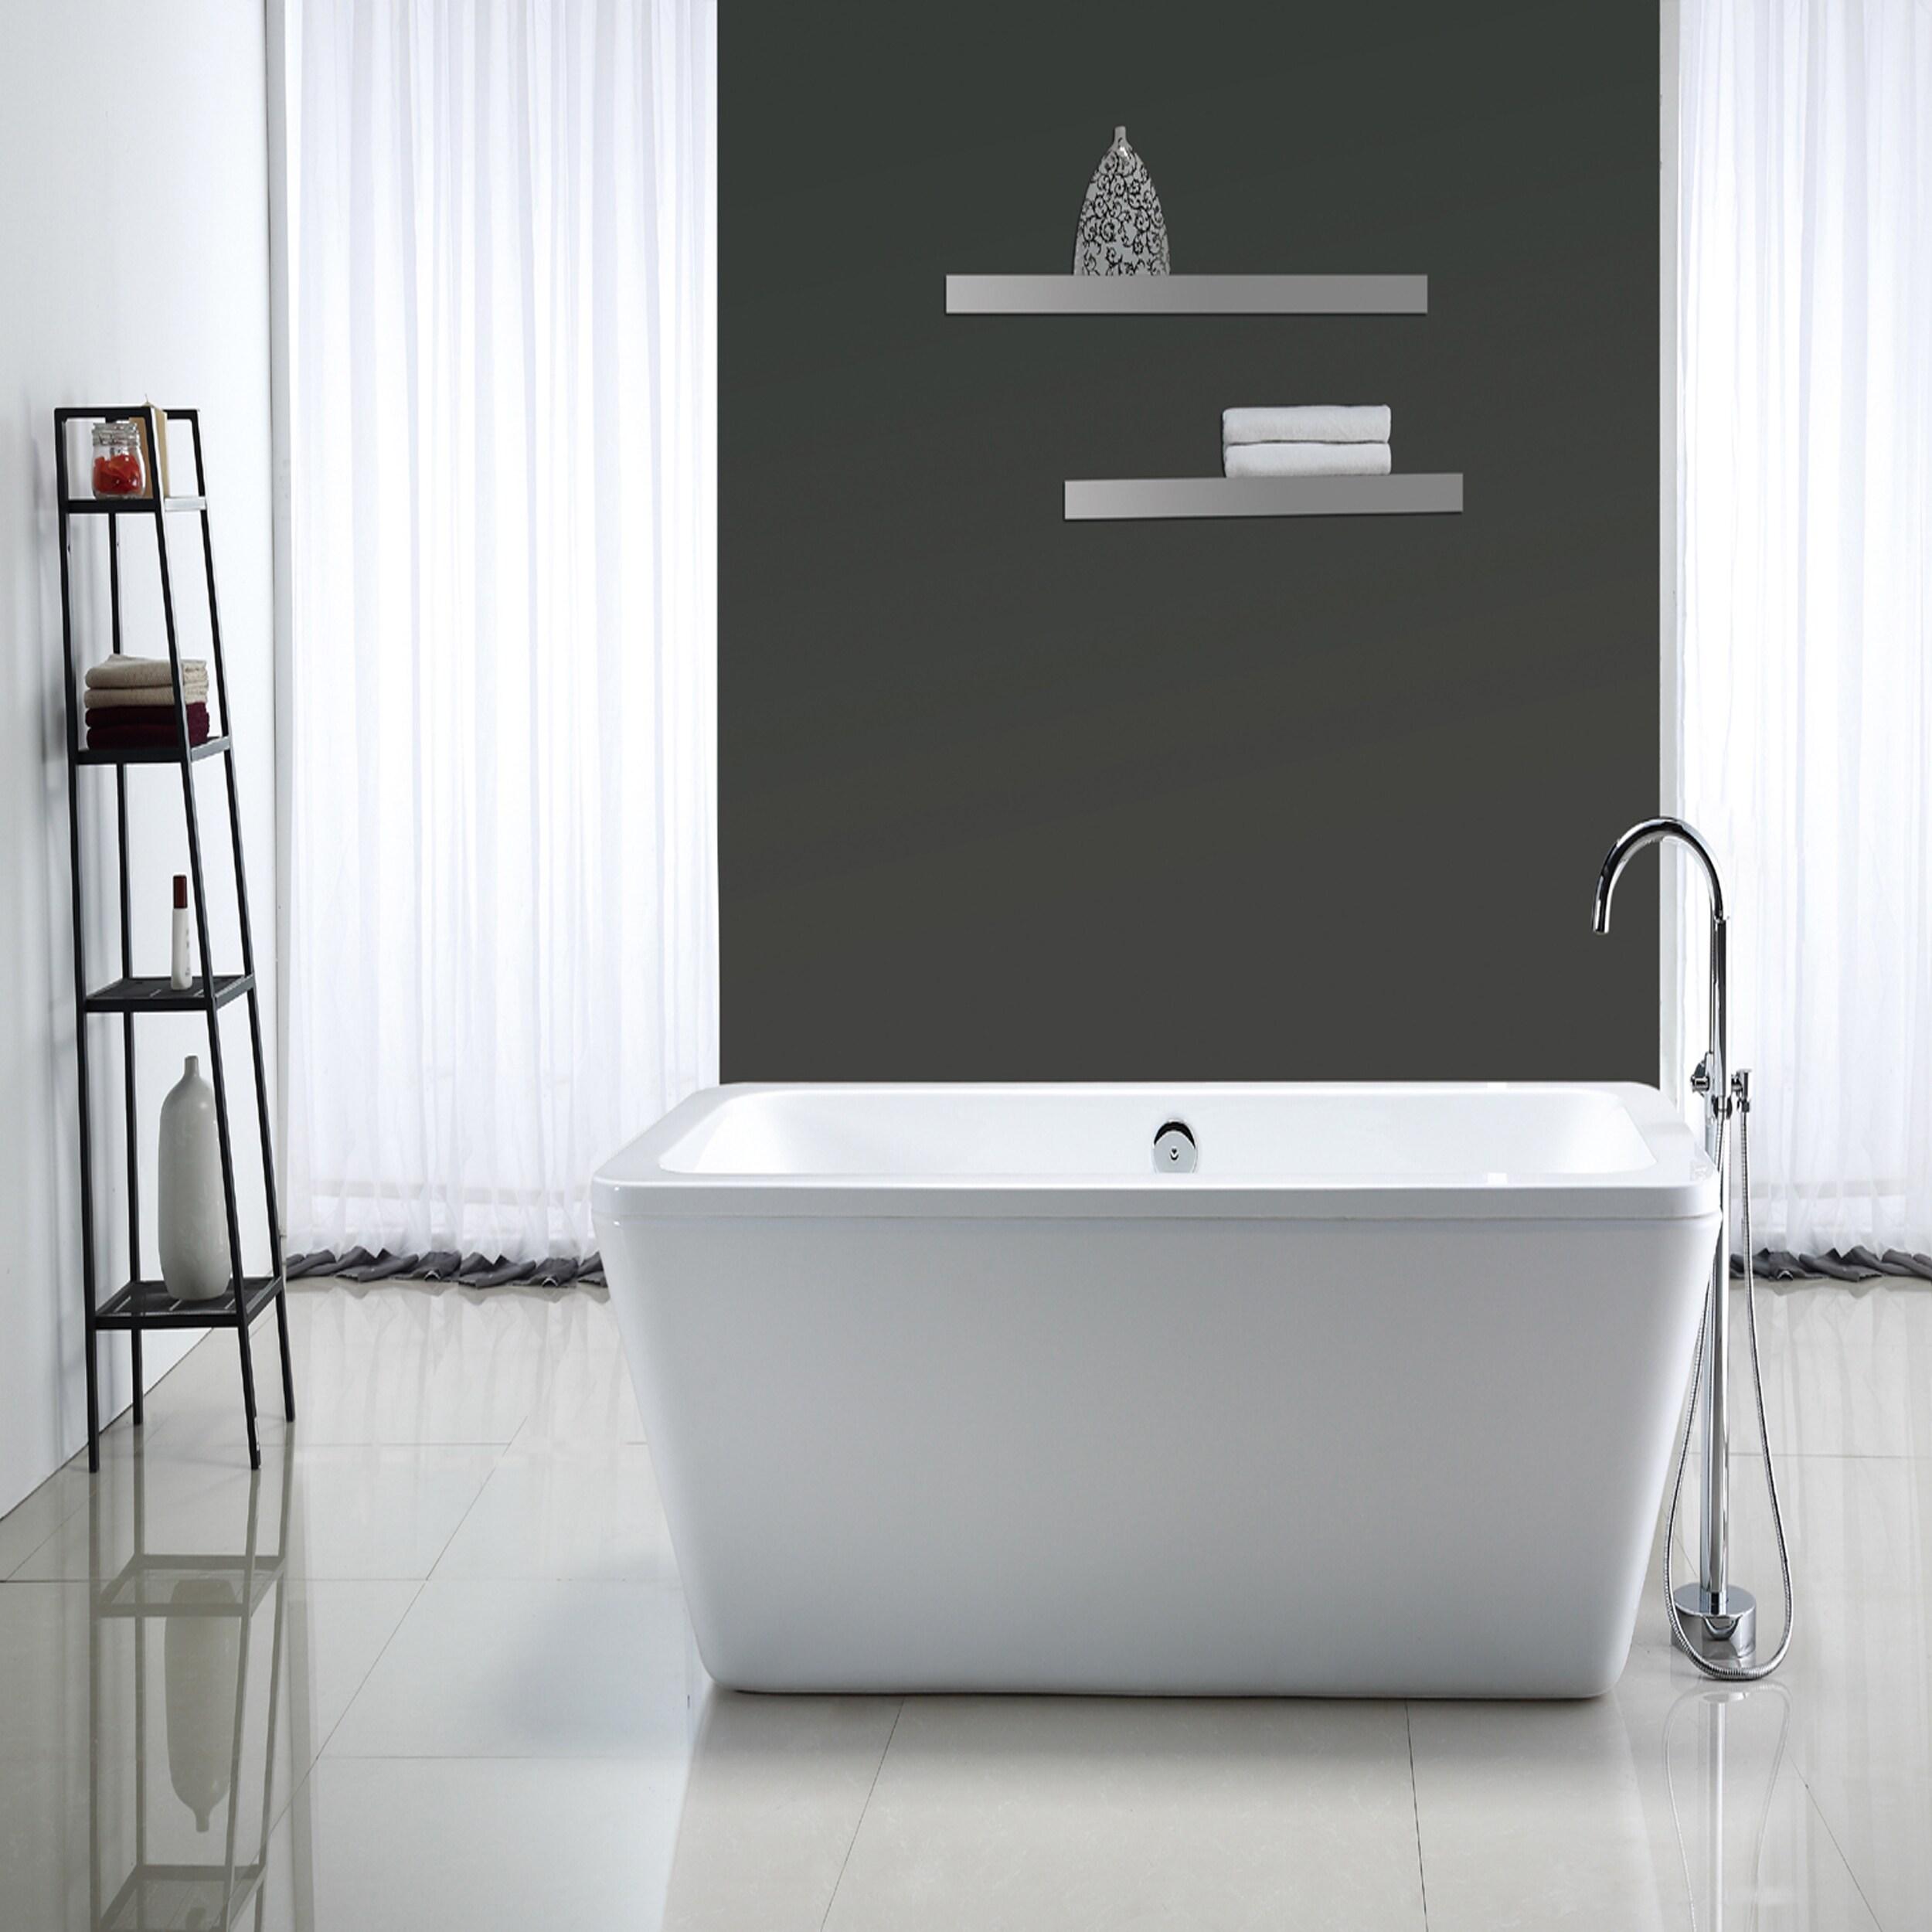 Shop OVE Decors Kido Acrylic 69-inch Freestanding Bath Tub - Free ...